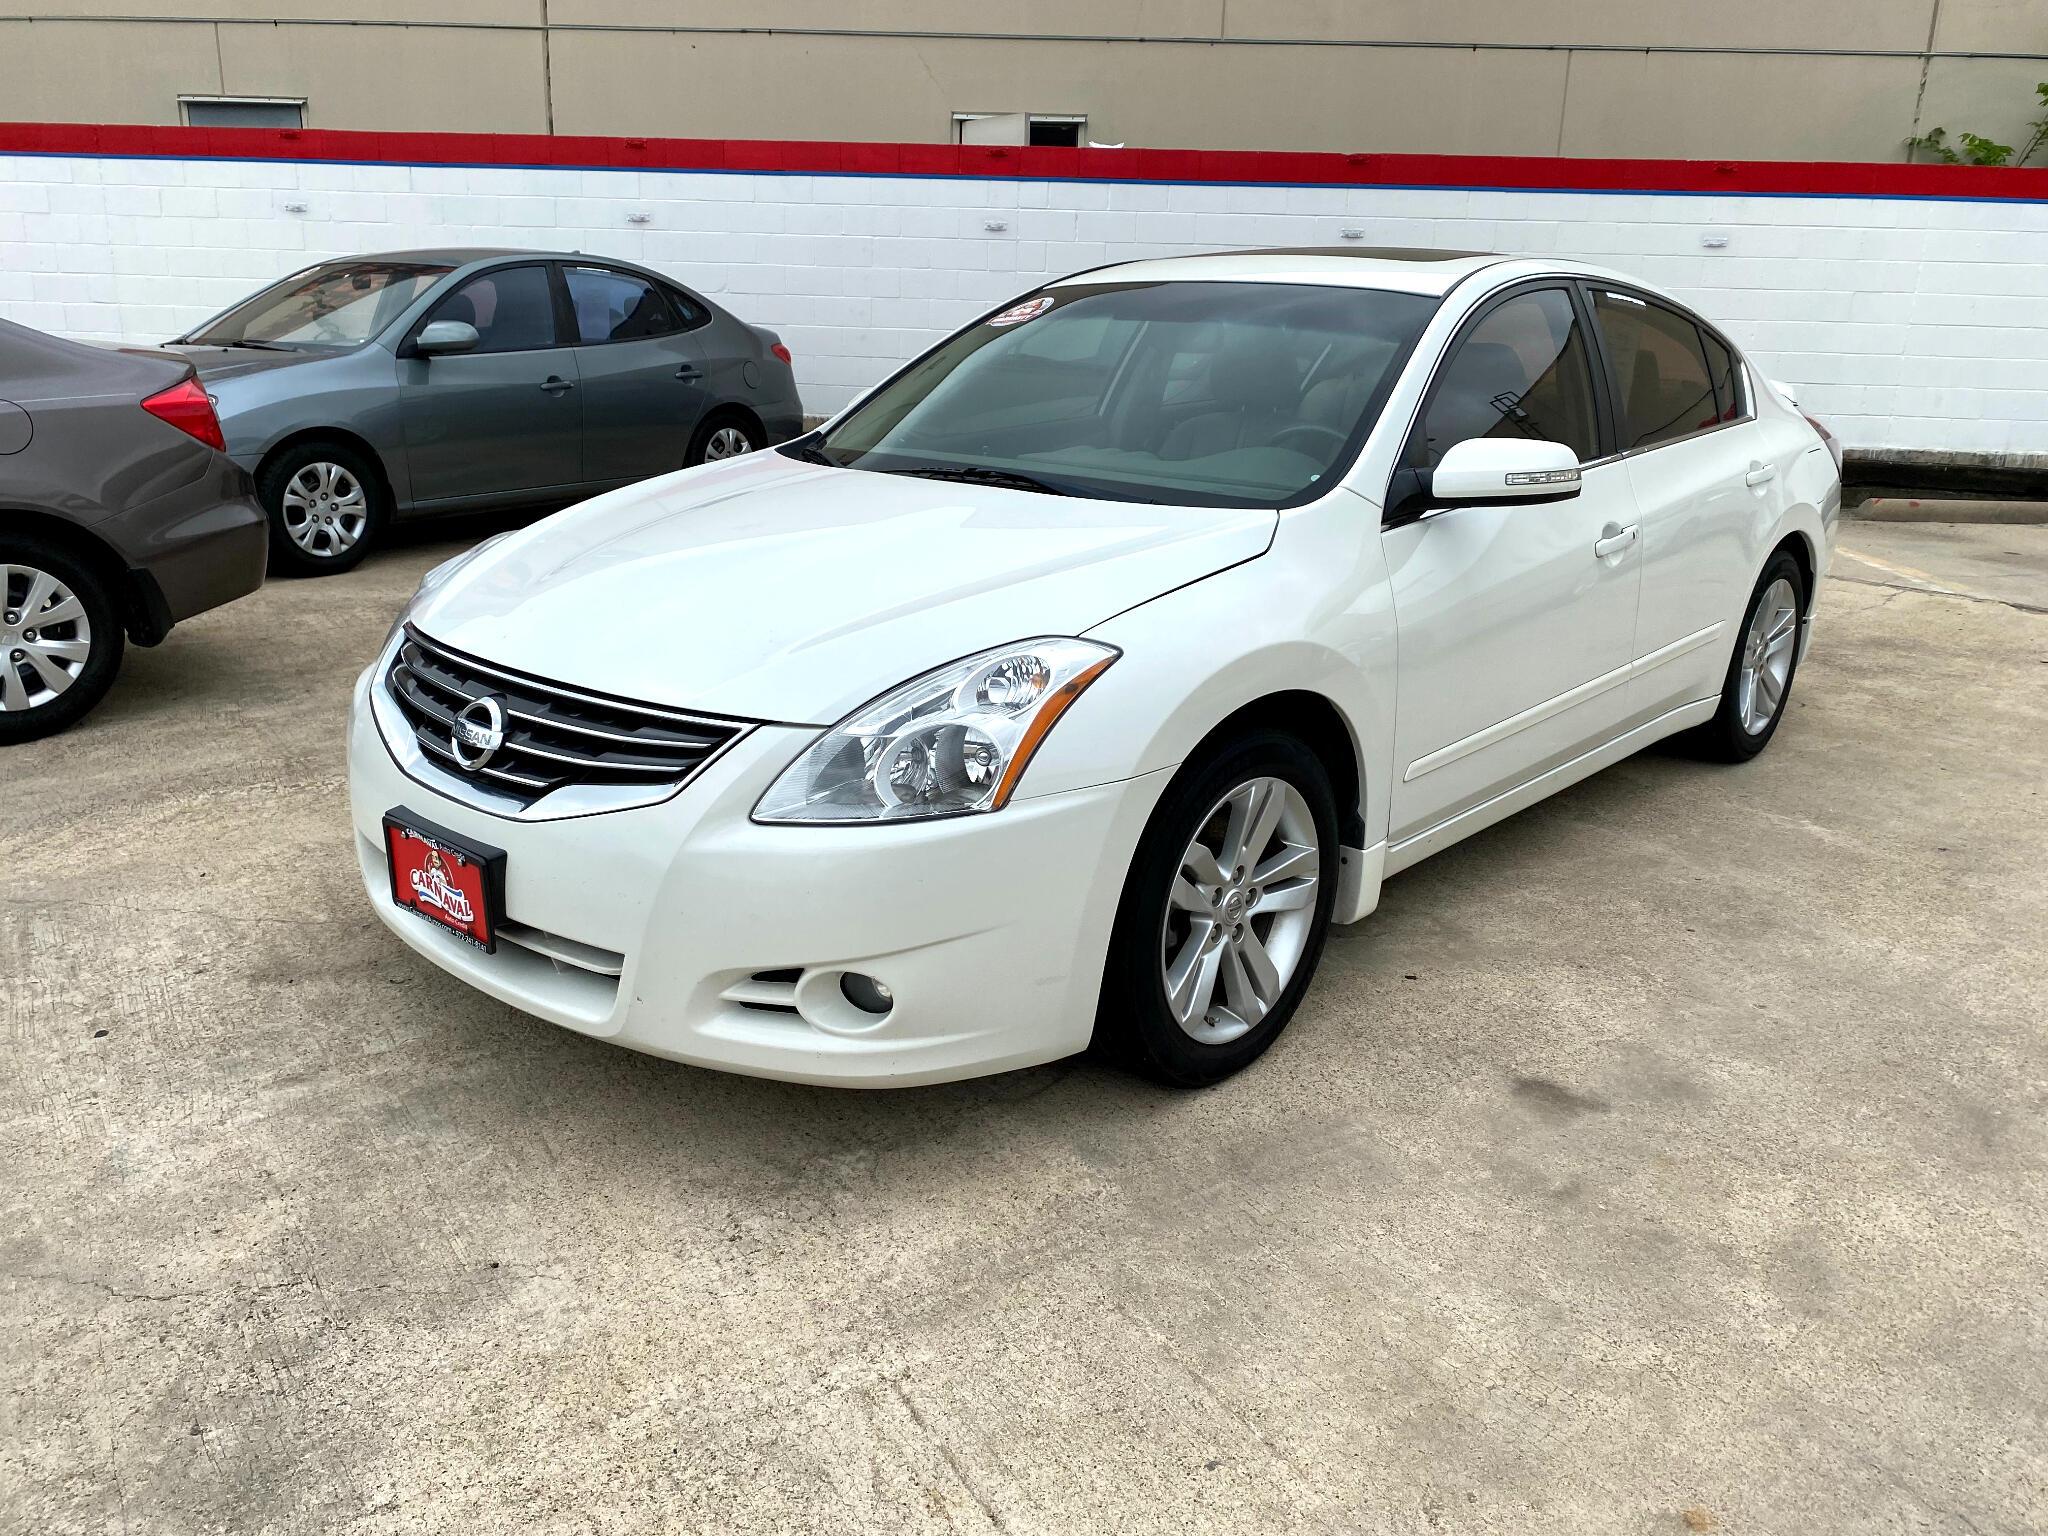 Nissan Altima 4dr Sdn V6 CVT 3.5 SR 2012